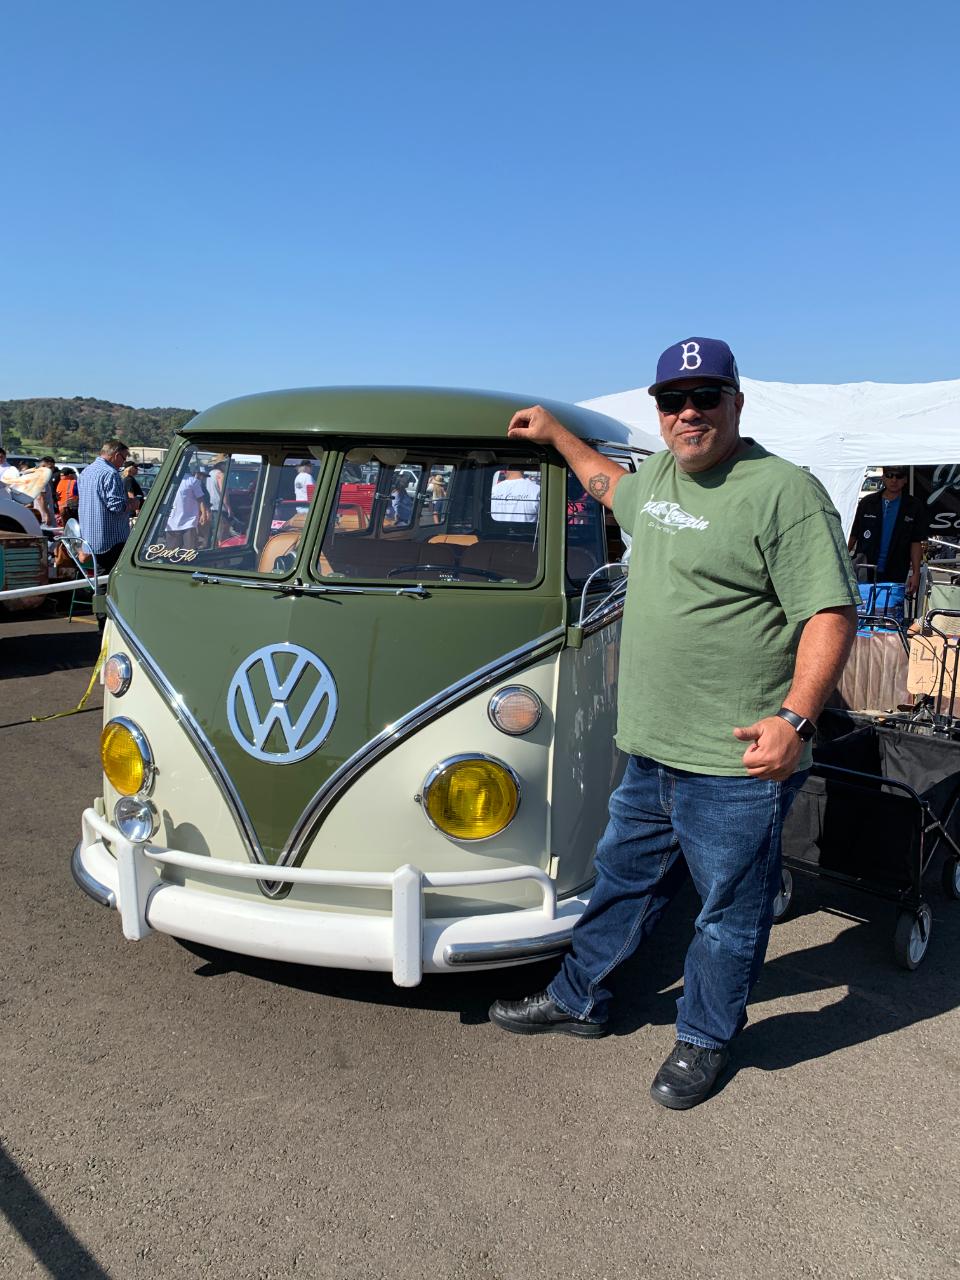 Mario Perez with his 1967 VW Bus